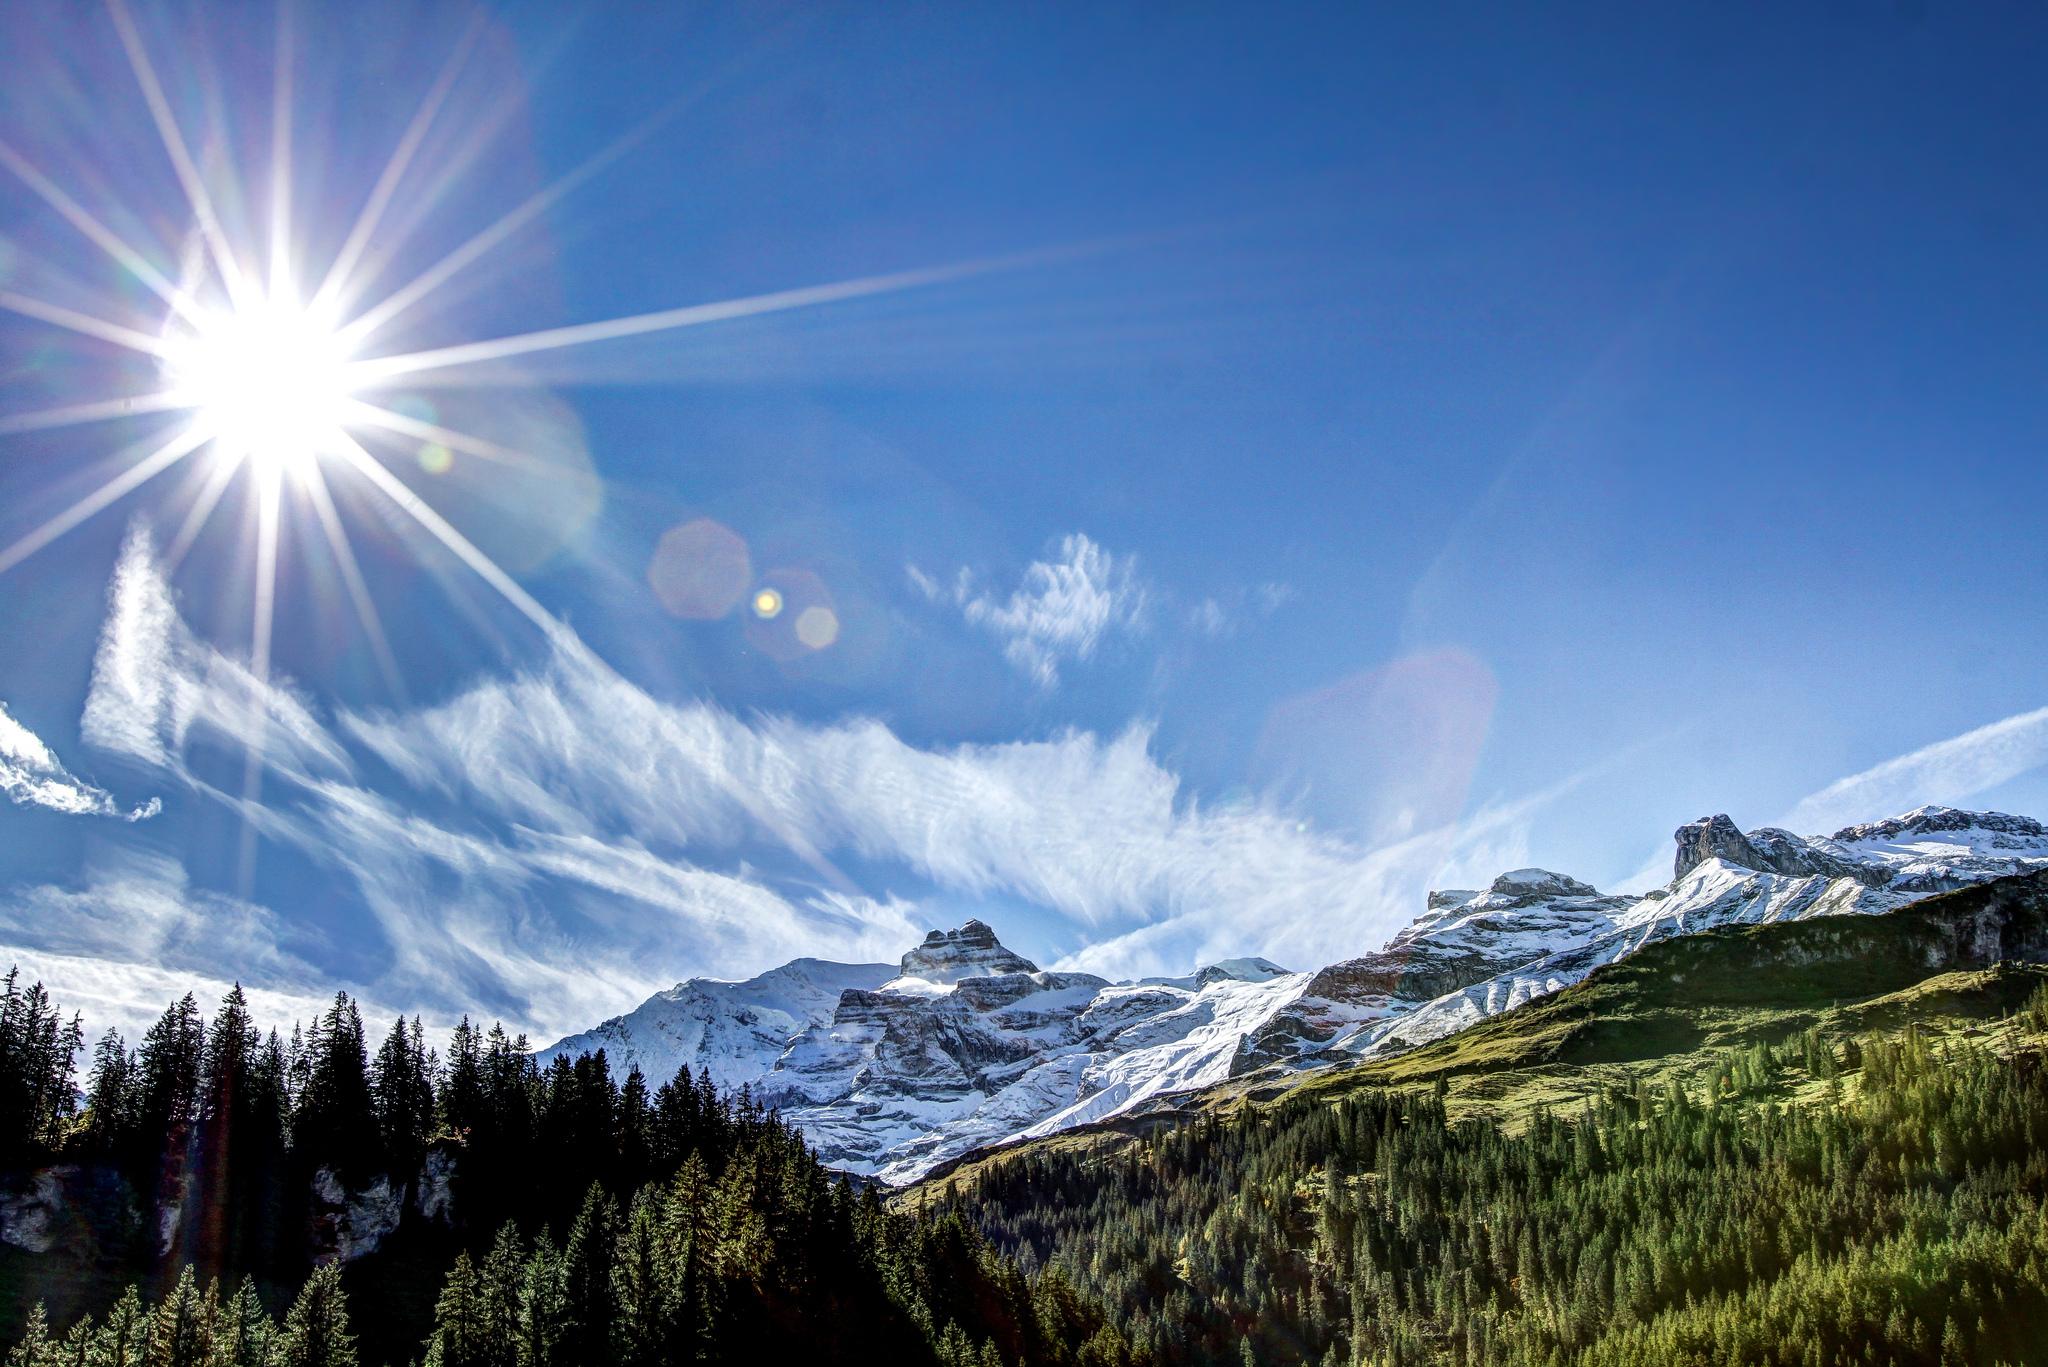 красивые картинки солнца в горах под